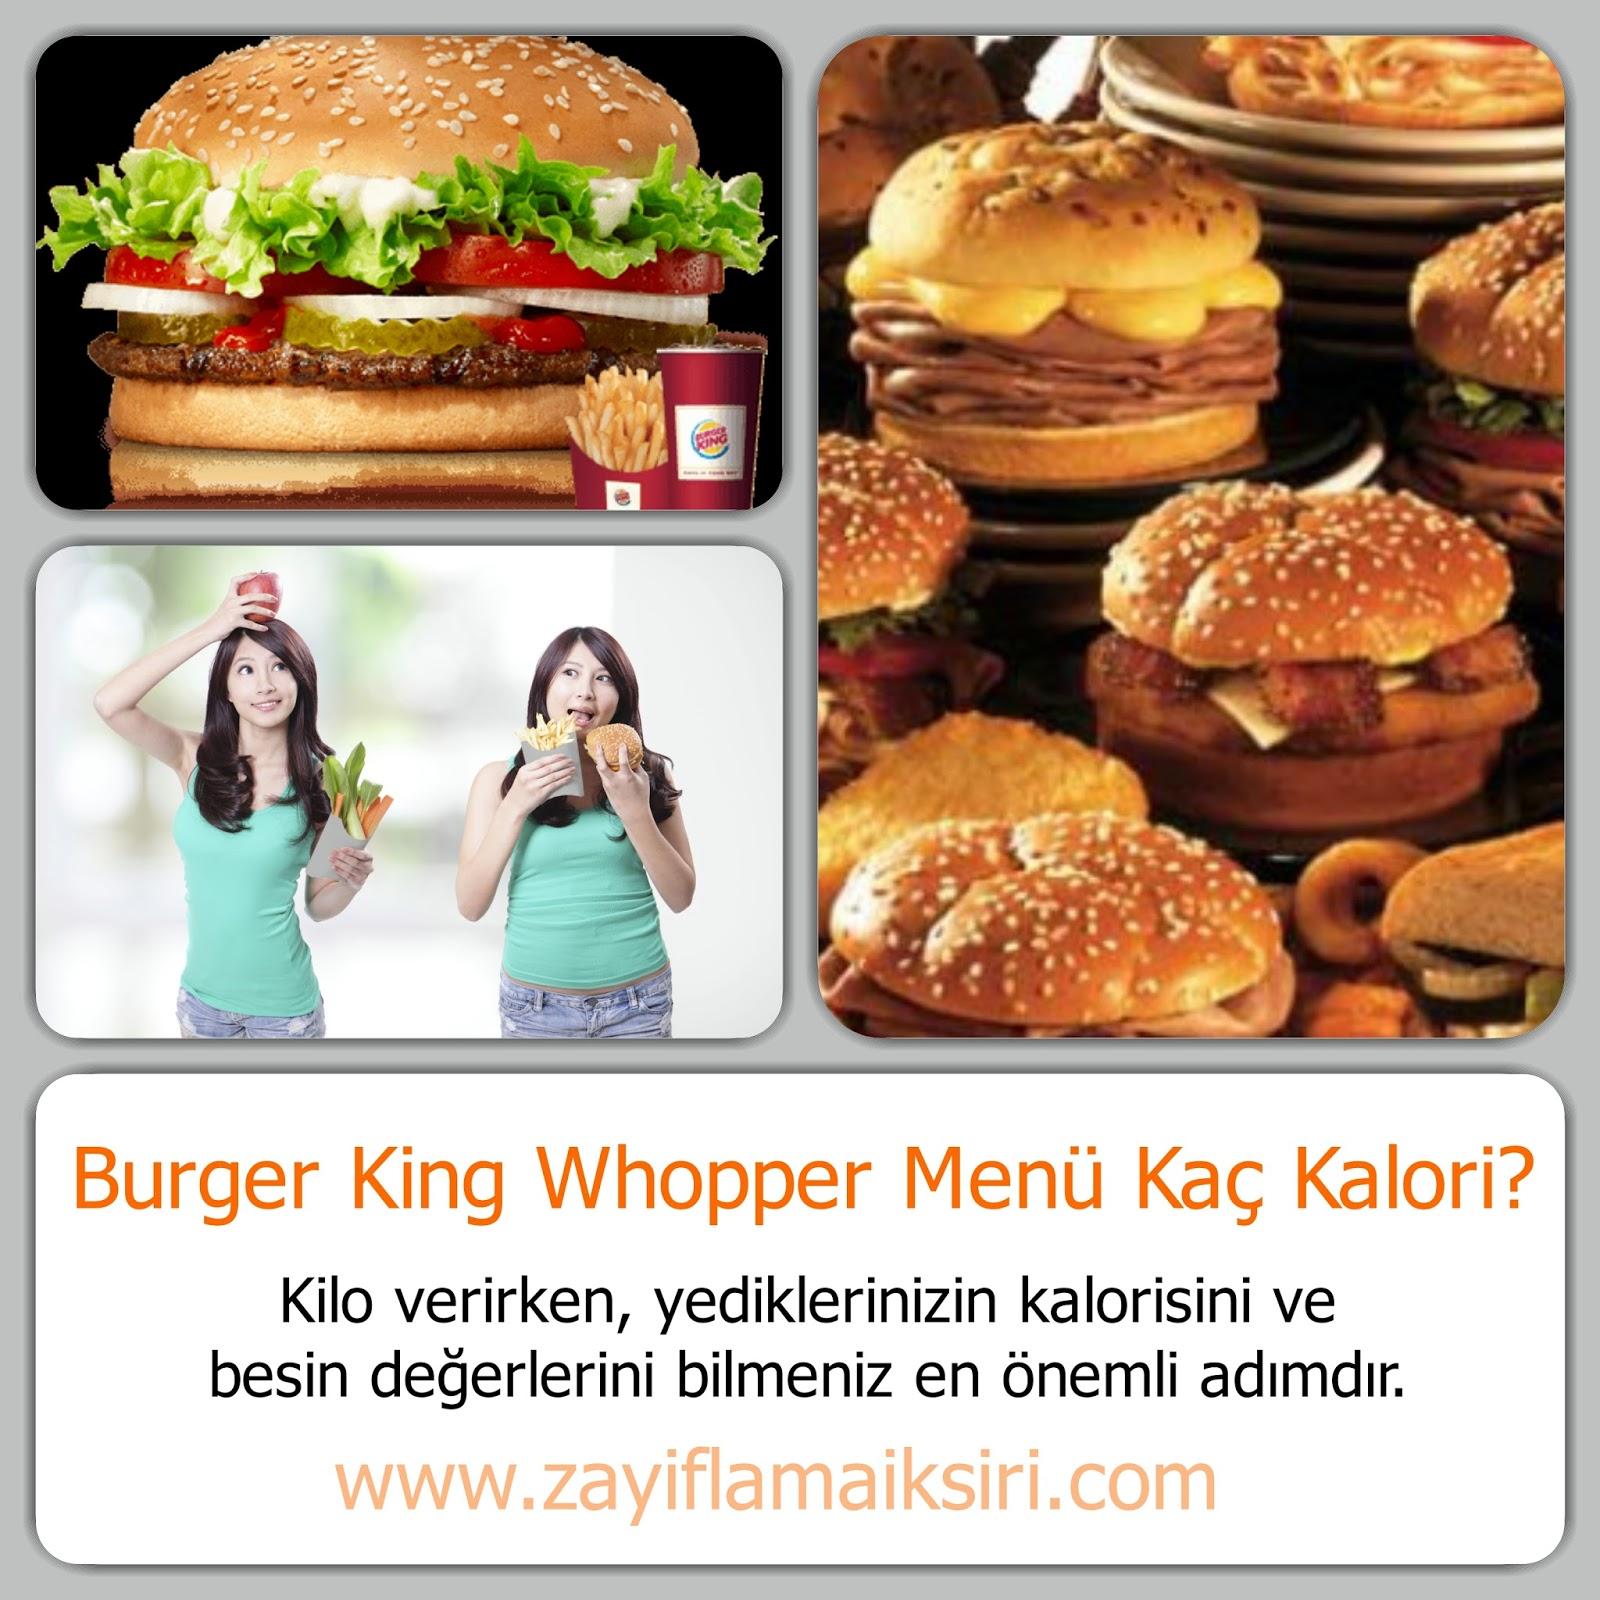 1 Kilo Yağ Kaç Kalori